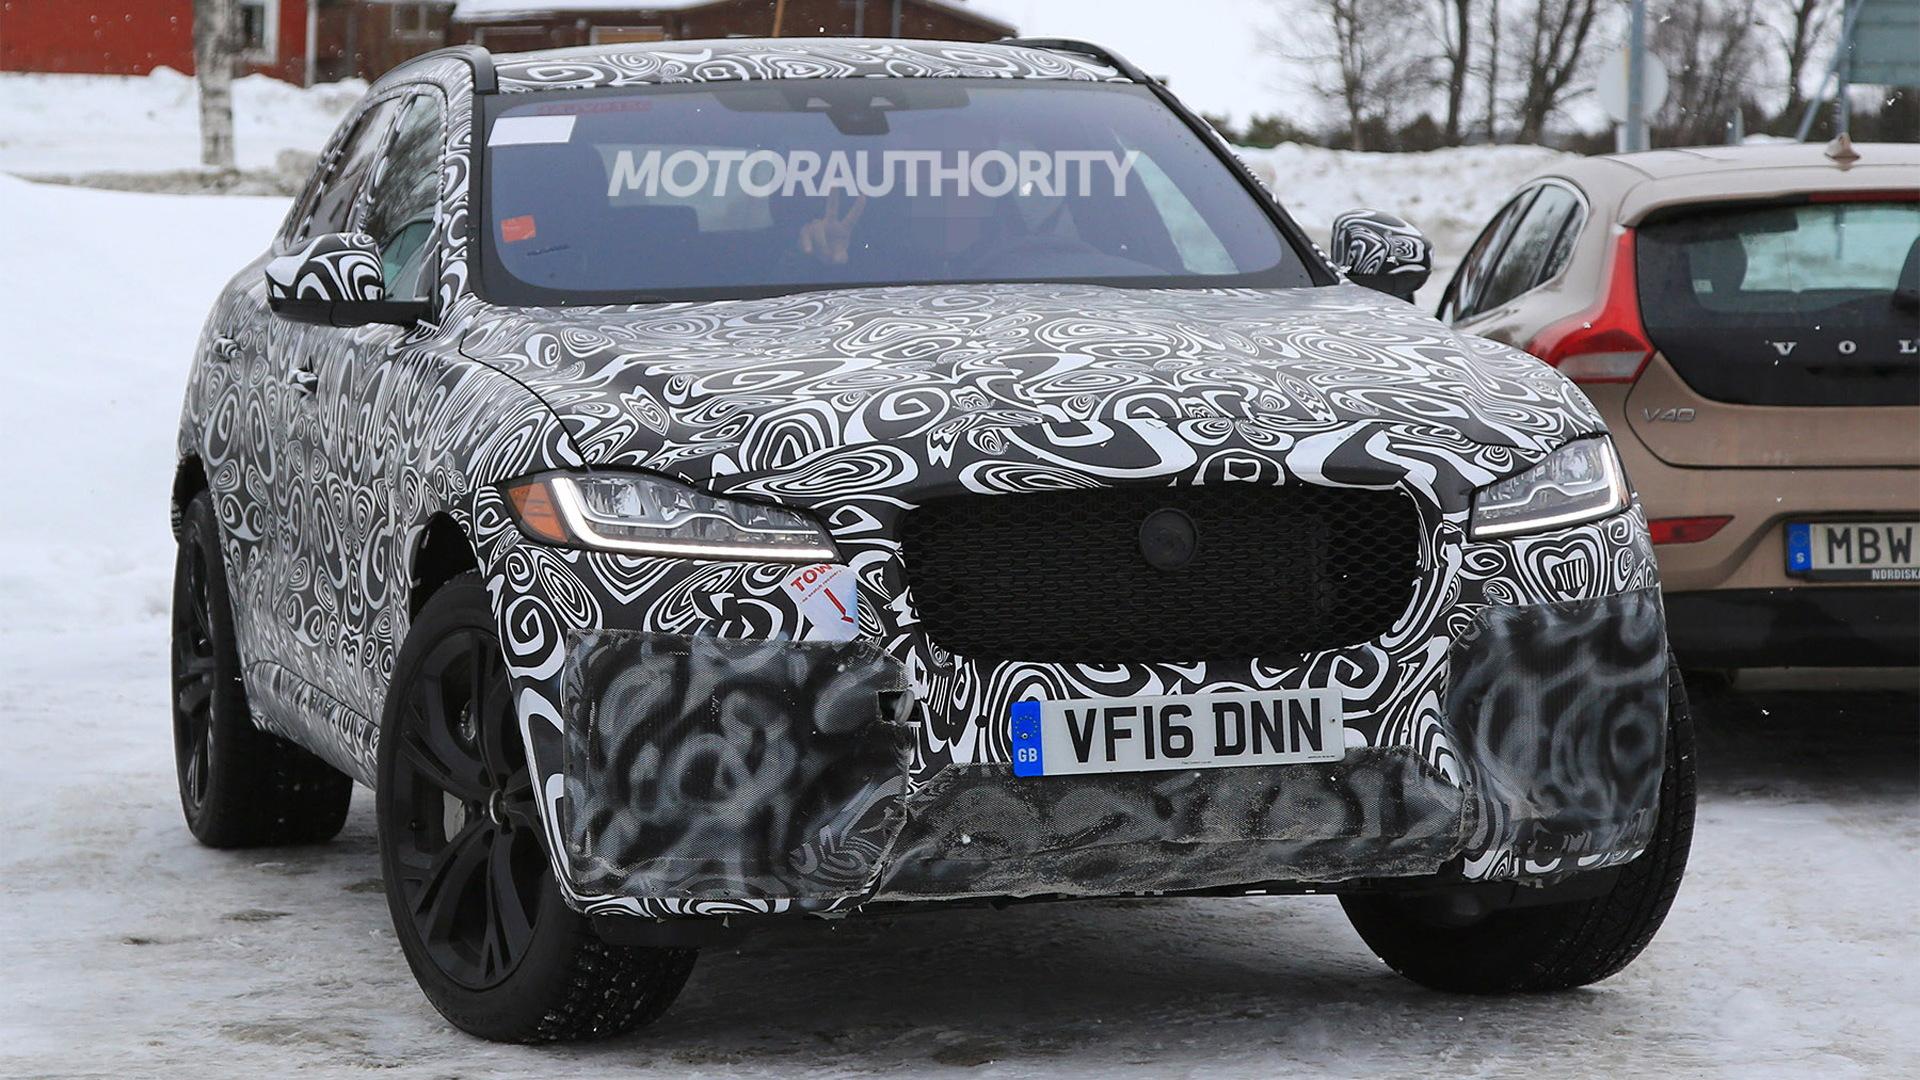 2019 Jaguar F-Pace SVR spy shots - Image via S. Baldauf/SB-Medien